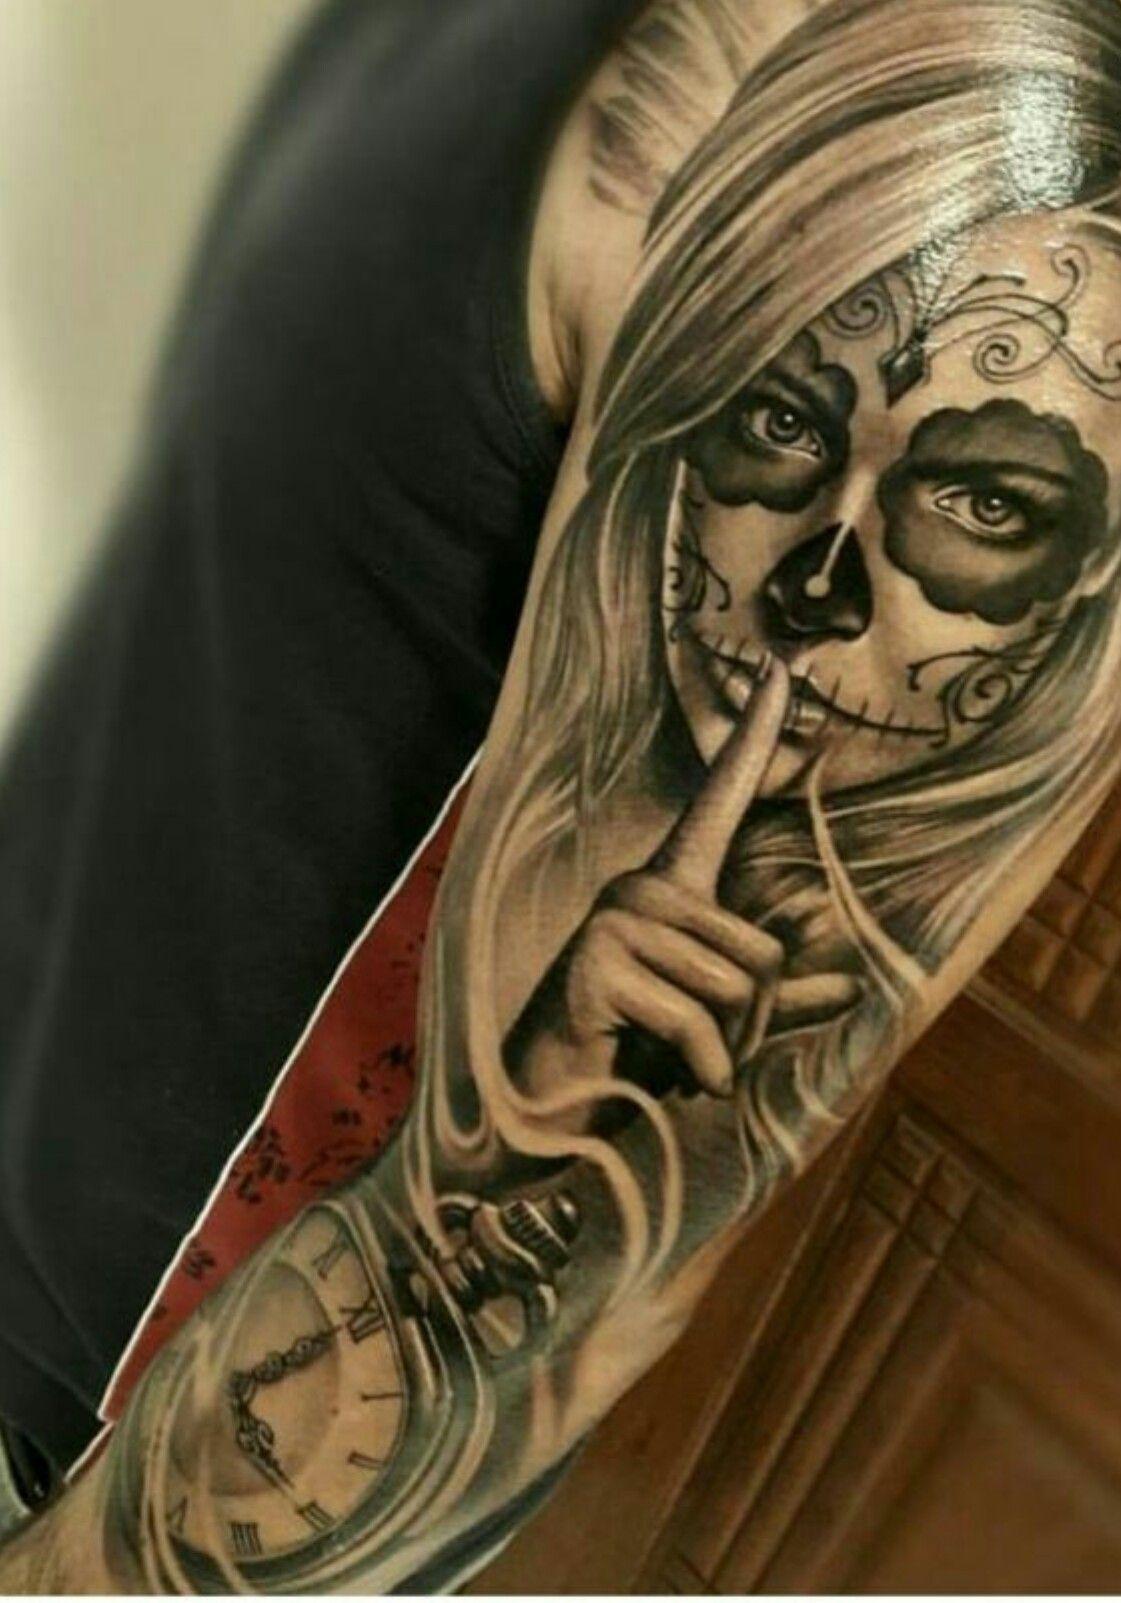 Pin By Arturo Flores On Tattoos Tatouage Tatouage Santa Muerte